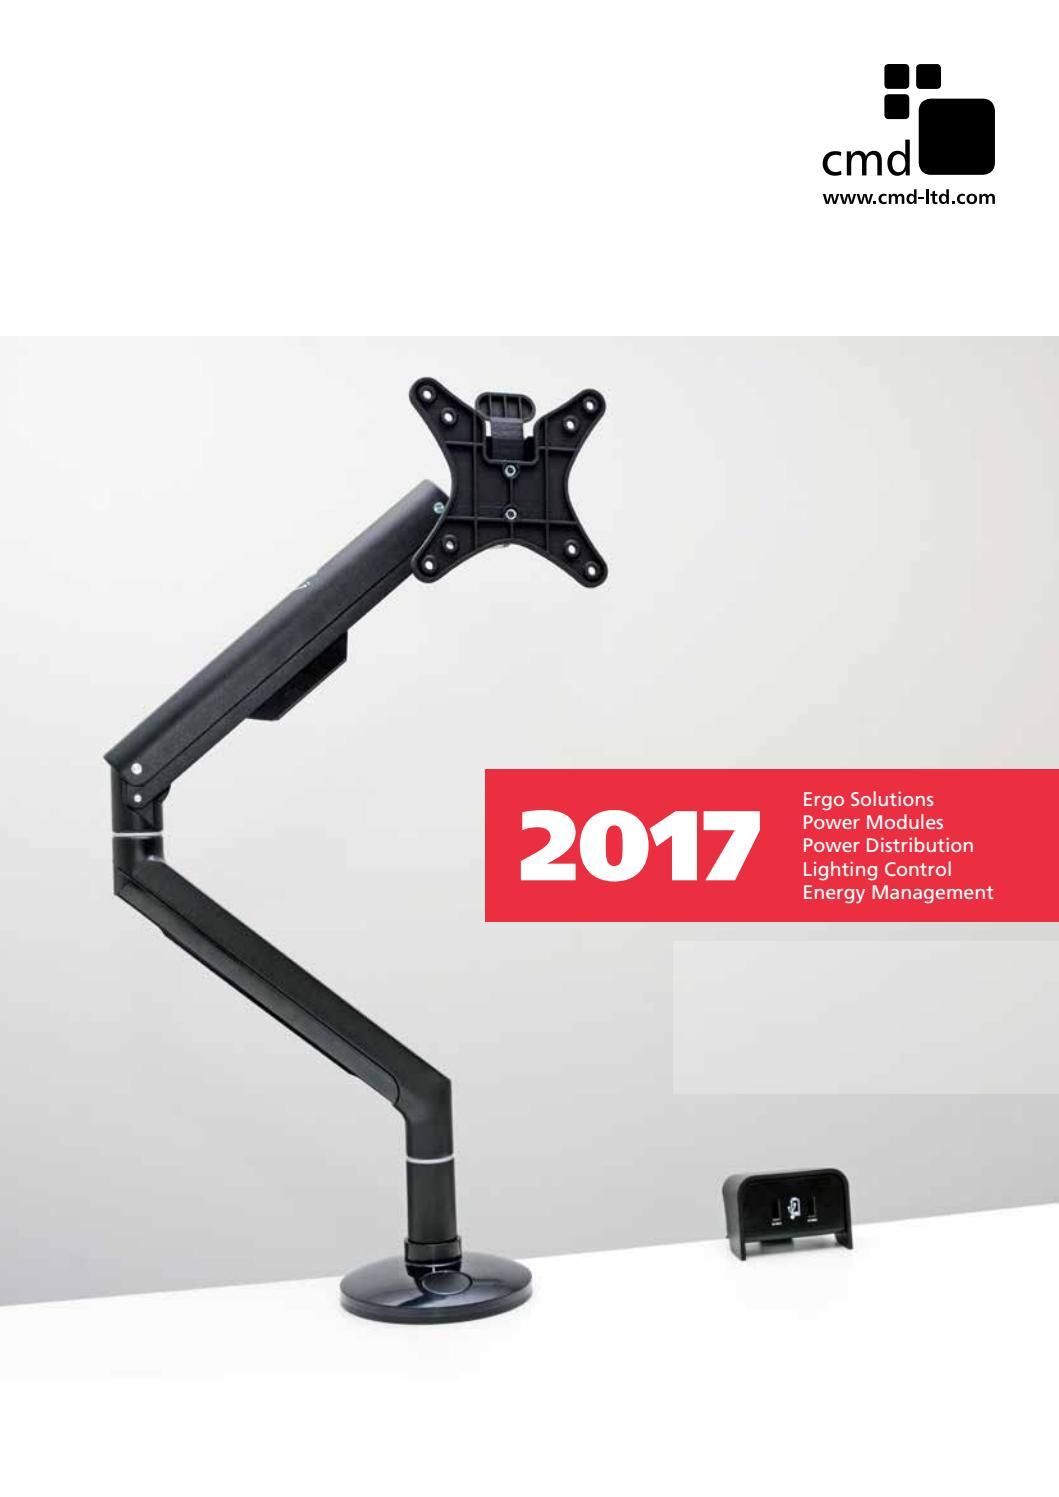 Cmd Ltd 2017 Product Catalogue By Issuu Arc Fault Circuit Breaker Qo120cafic Noninterchangable